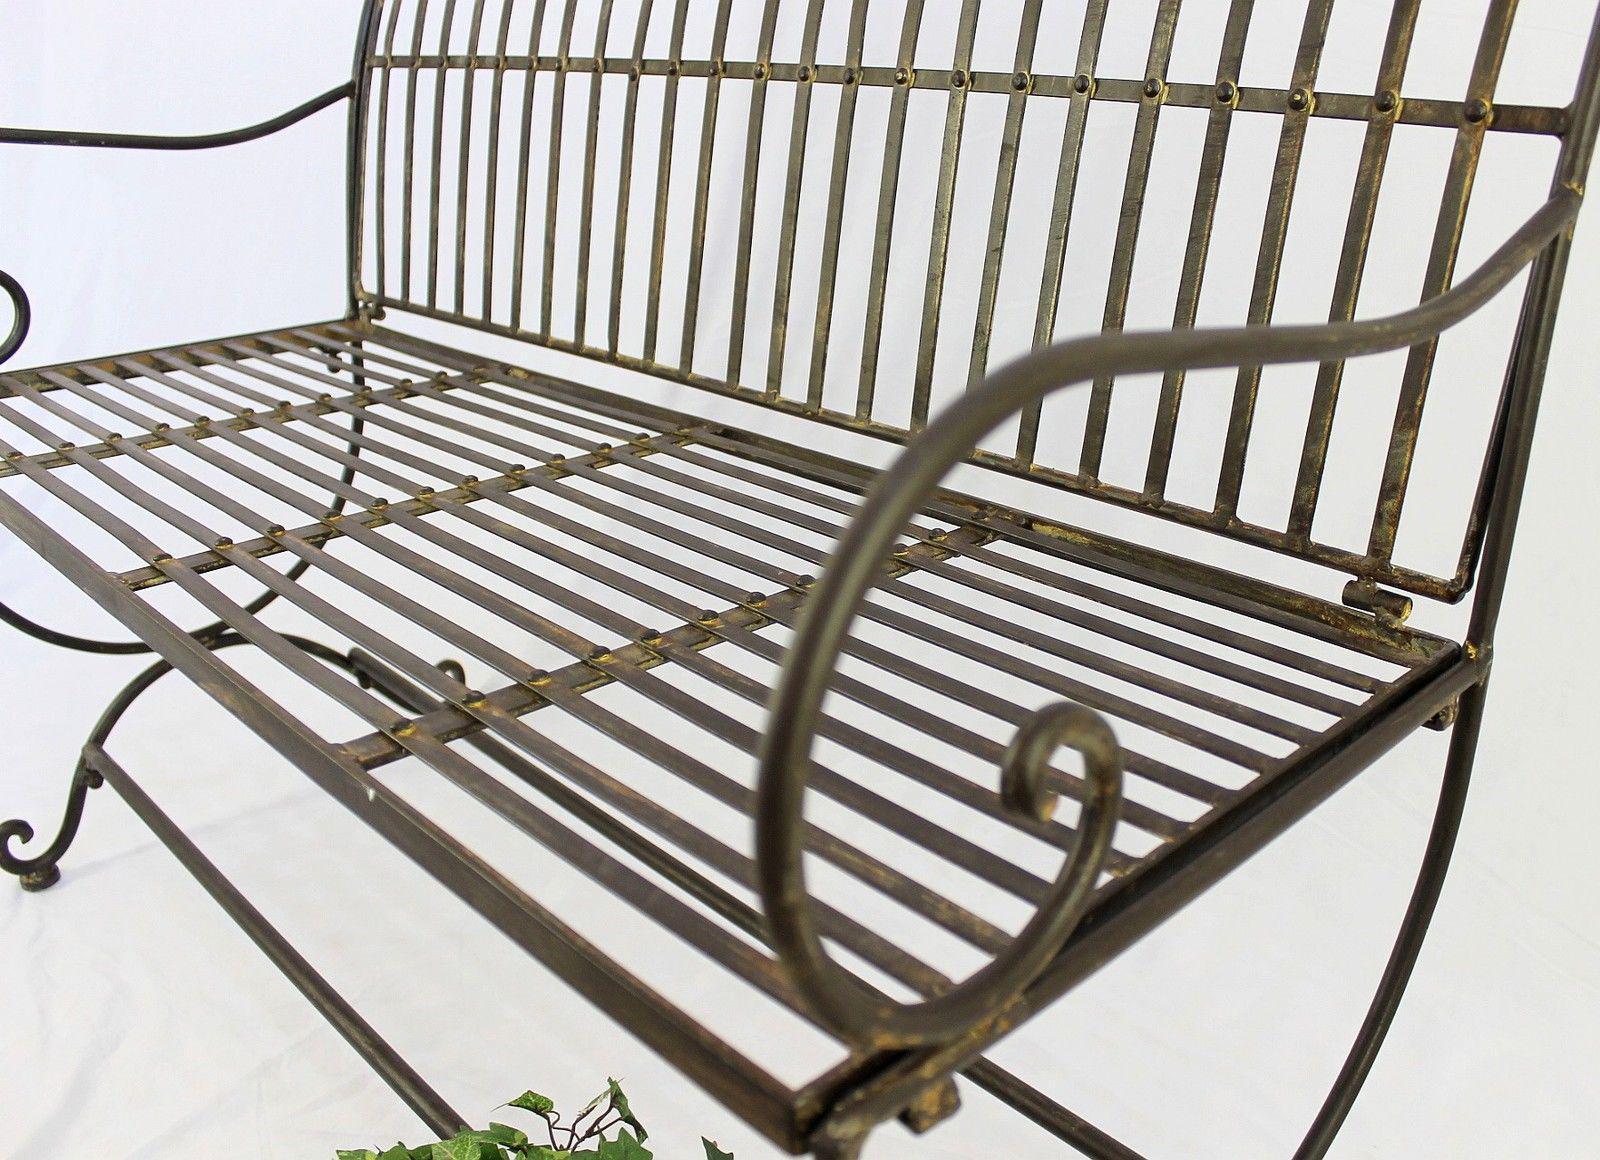 bank finca 063 2 sitzer aus metall gartenbank sitzbank baumbank 102 cm braun 4019220600637 ebay. Black Bedroom Furniture Sets. Home Design Ideas